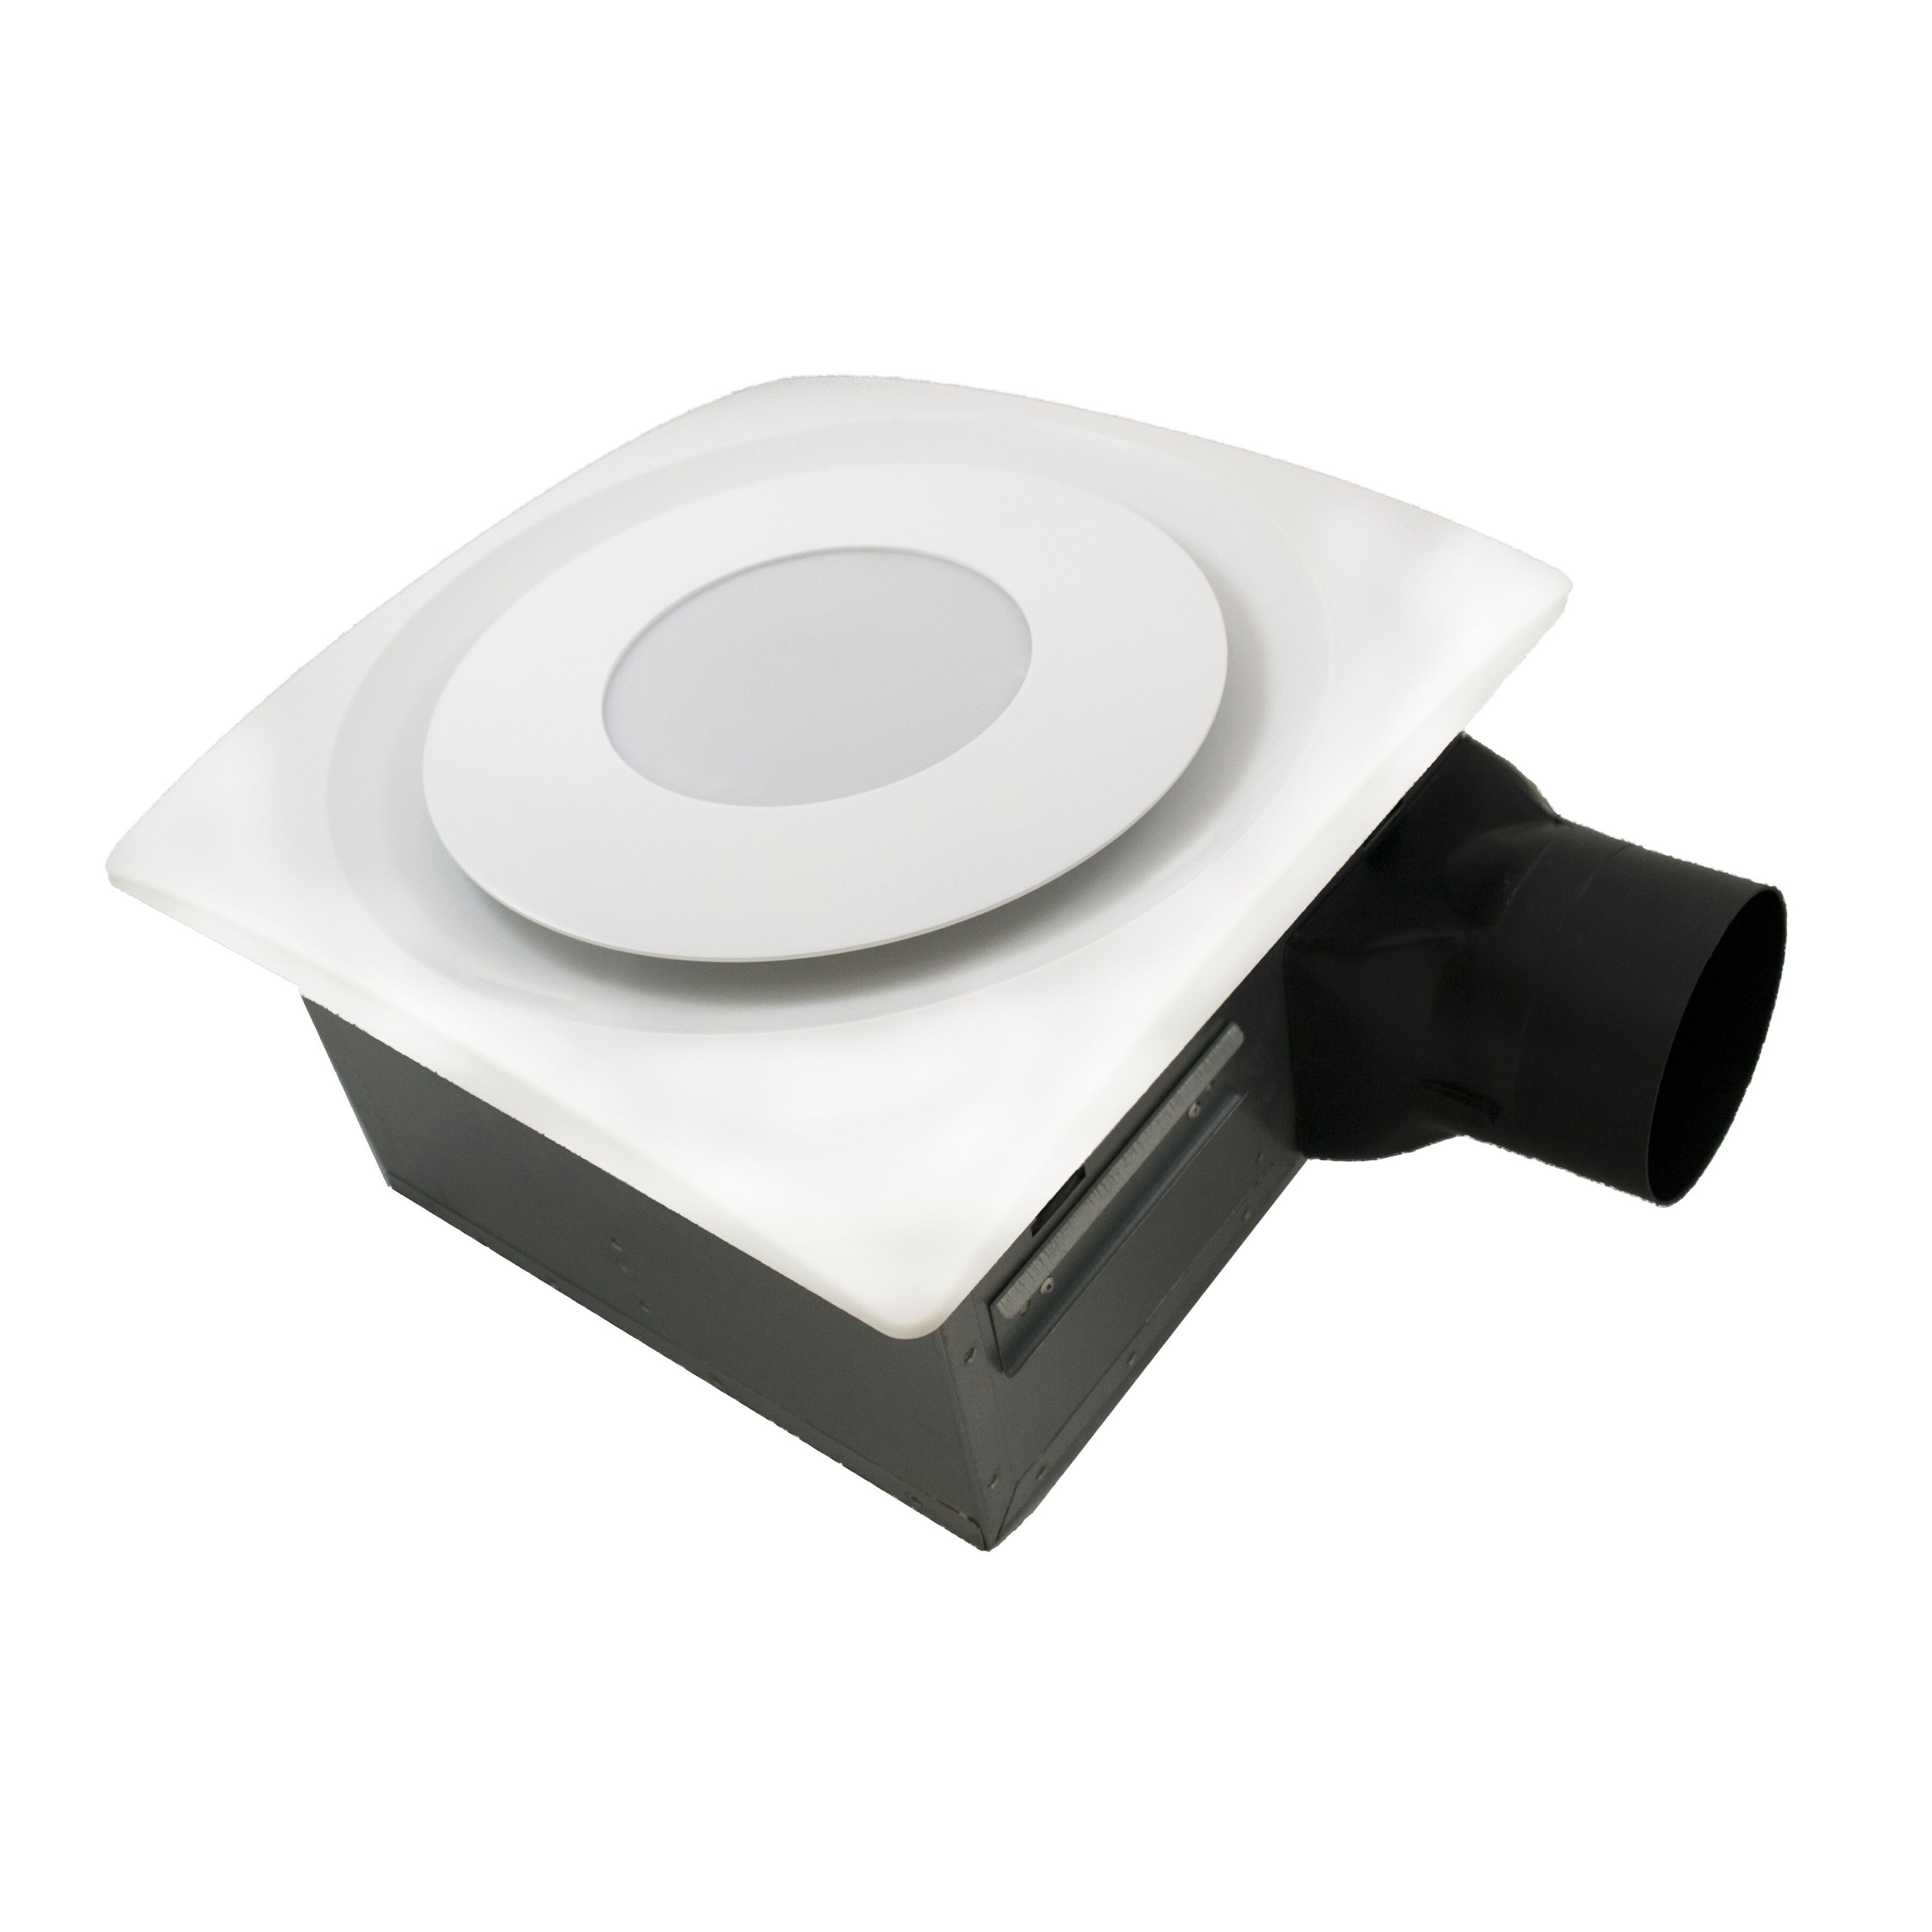 aero pure slimfit 120 cfm bathroom fan with light and sensor reviews. Black Bedroom Furniture Sets. Home Design Ideas